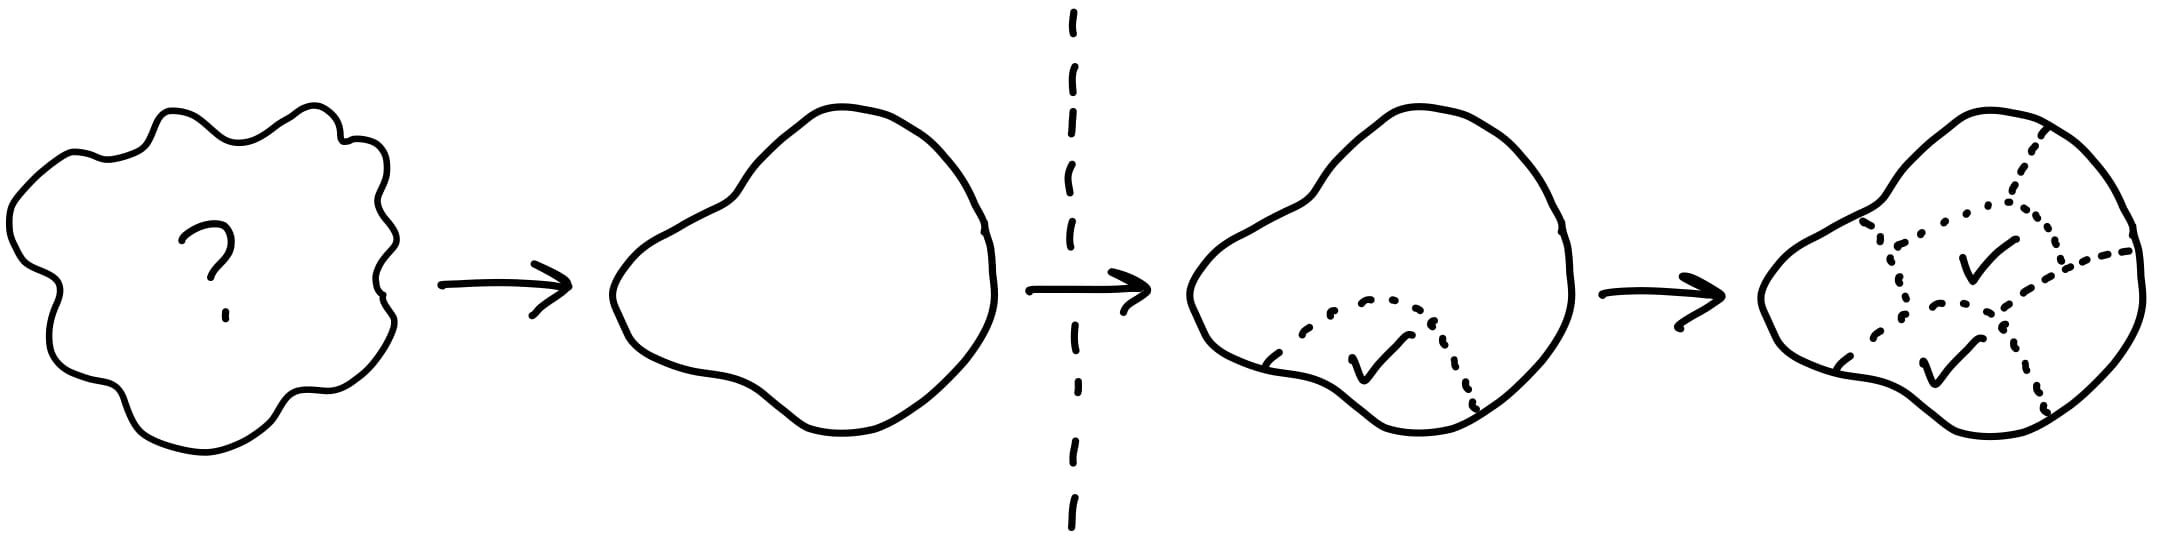 assets/shape-up-cover.jpg